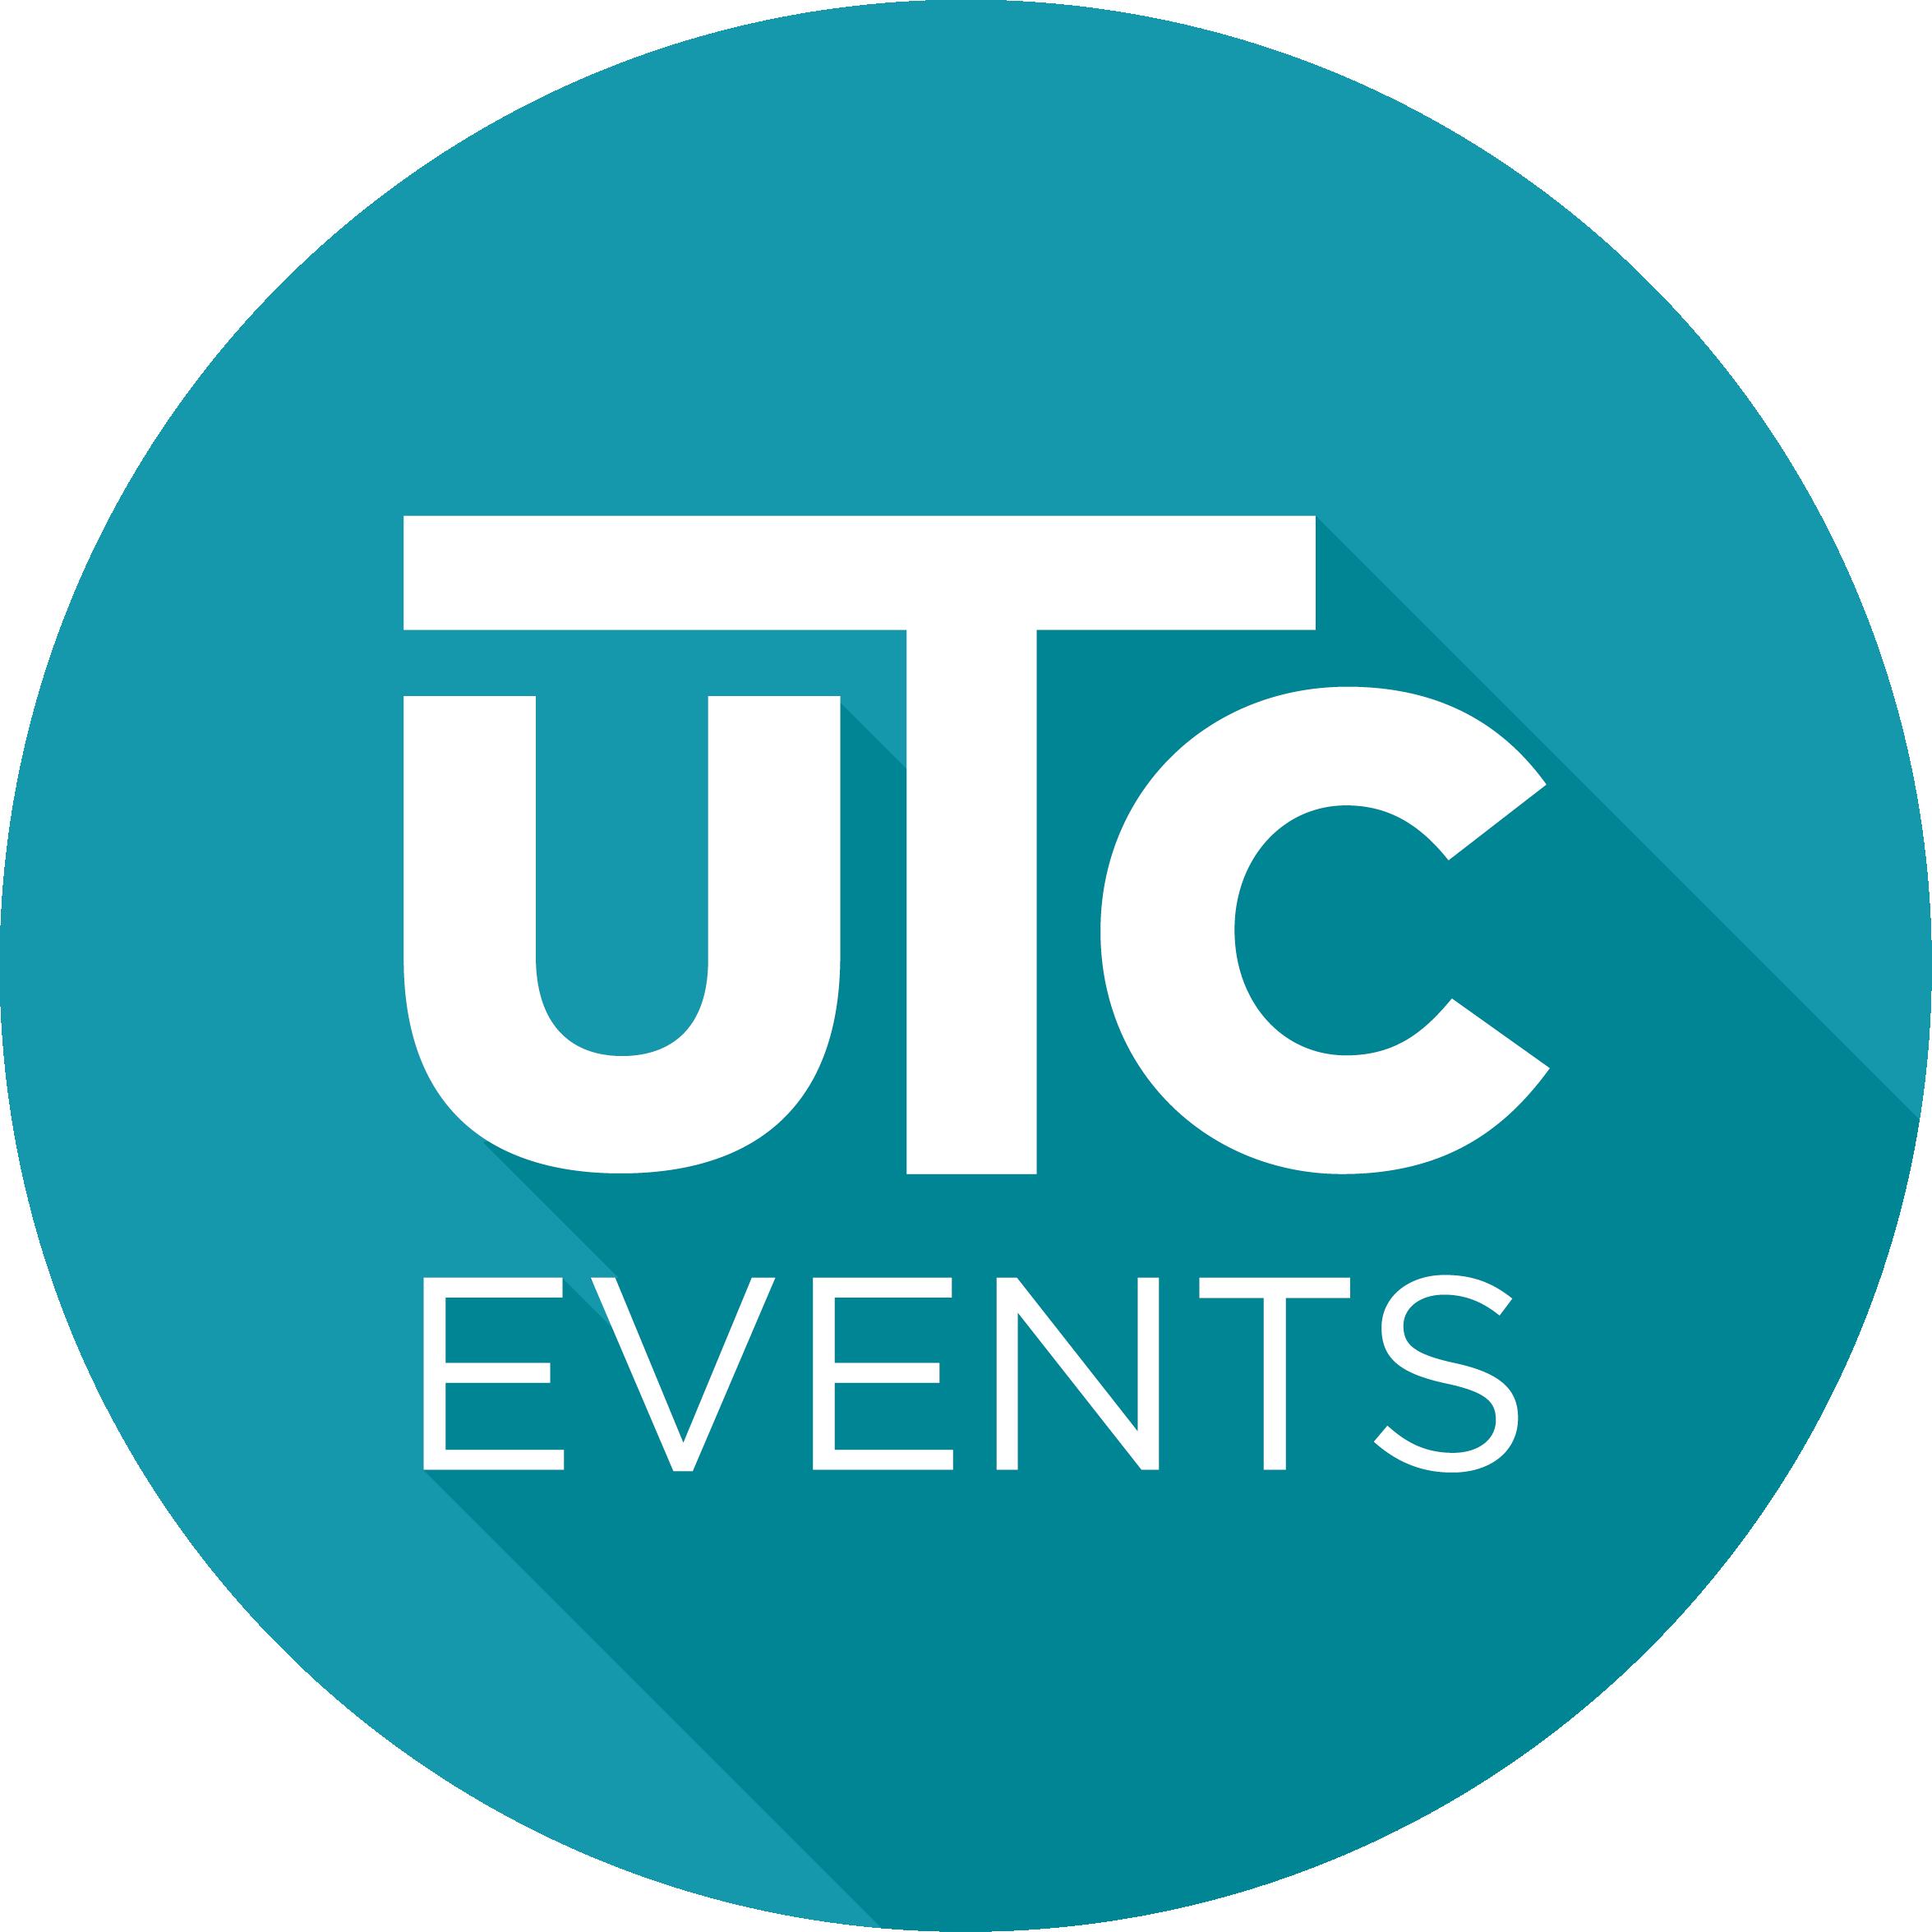 UTC New Logo_HR.png